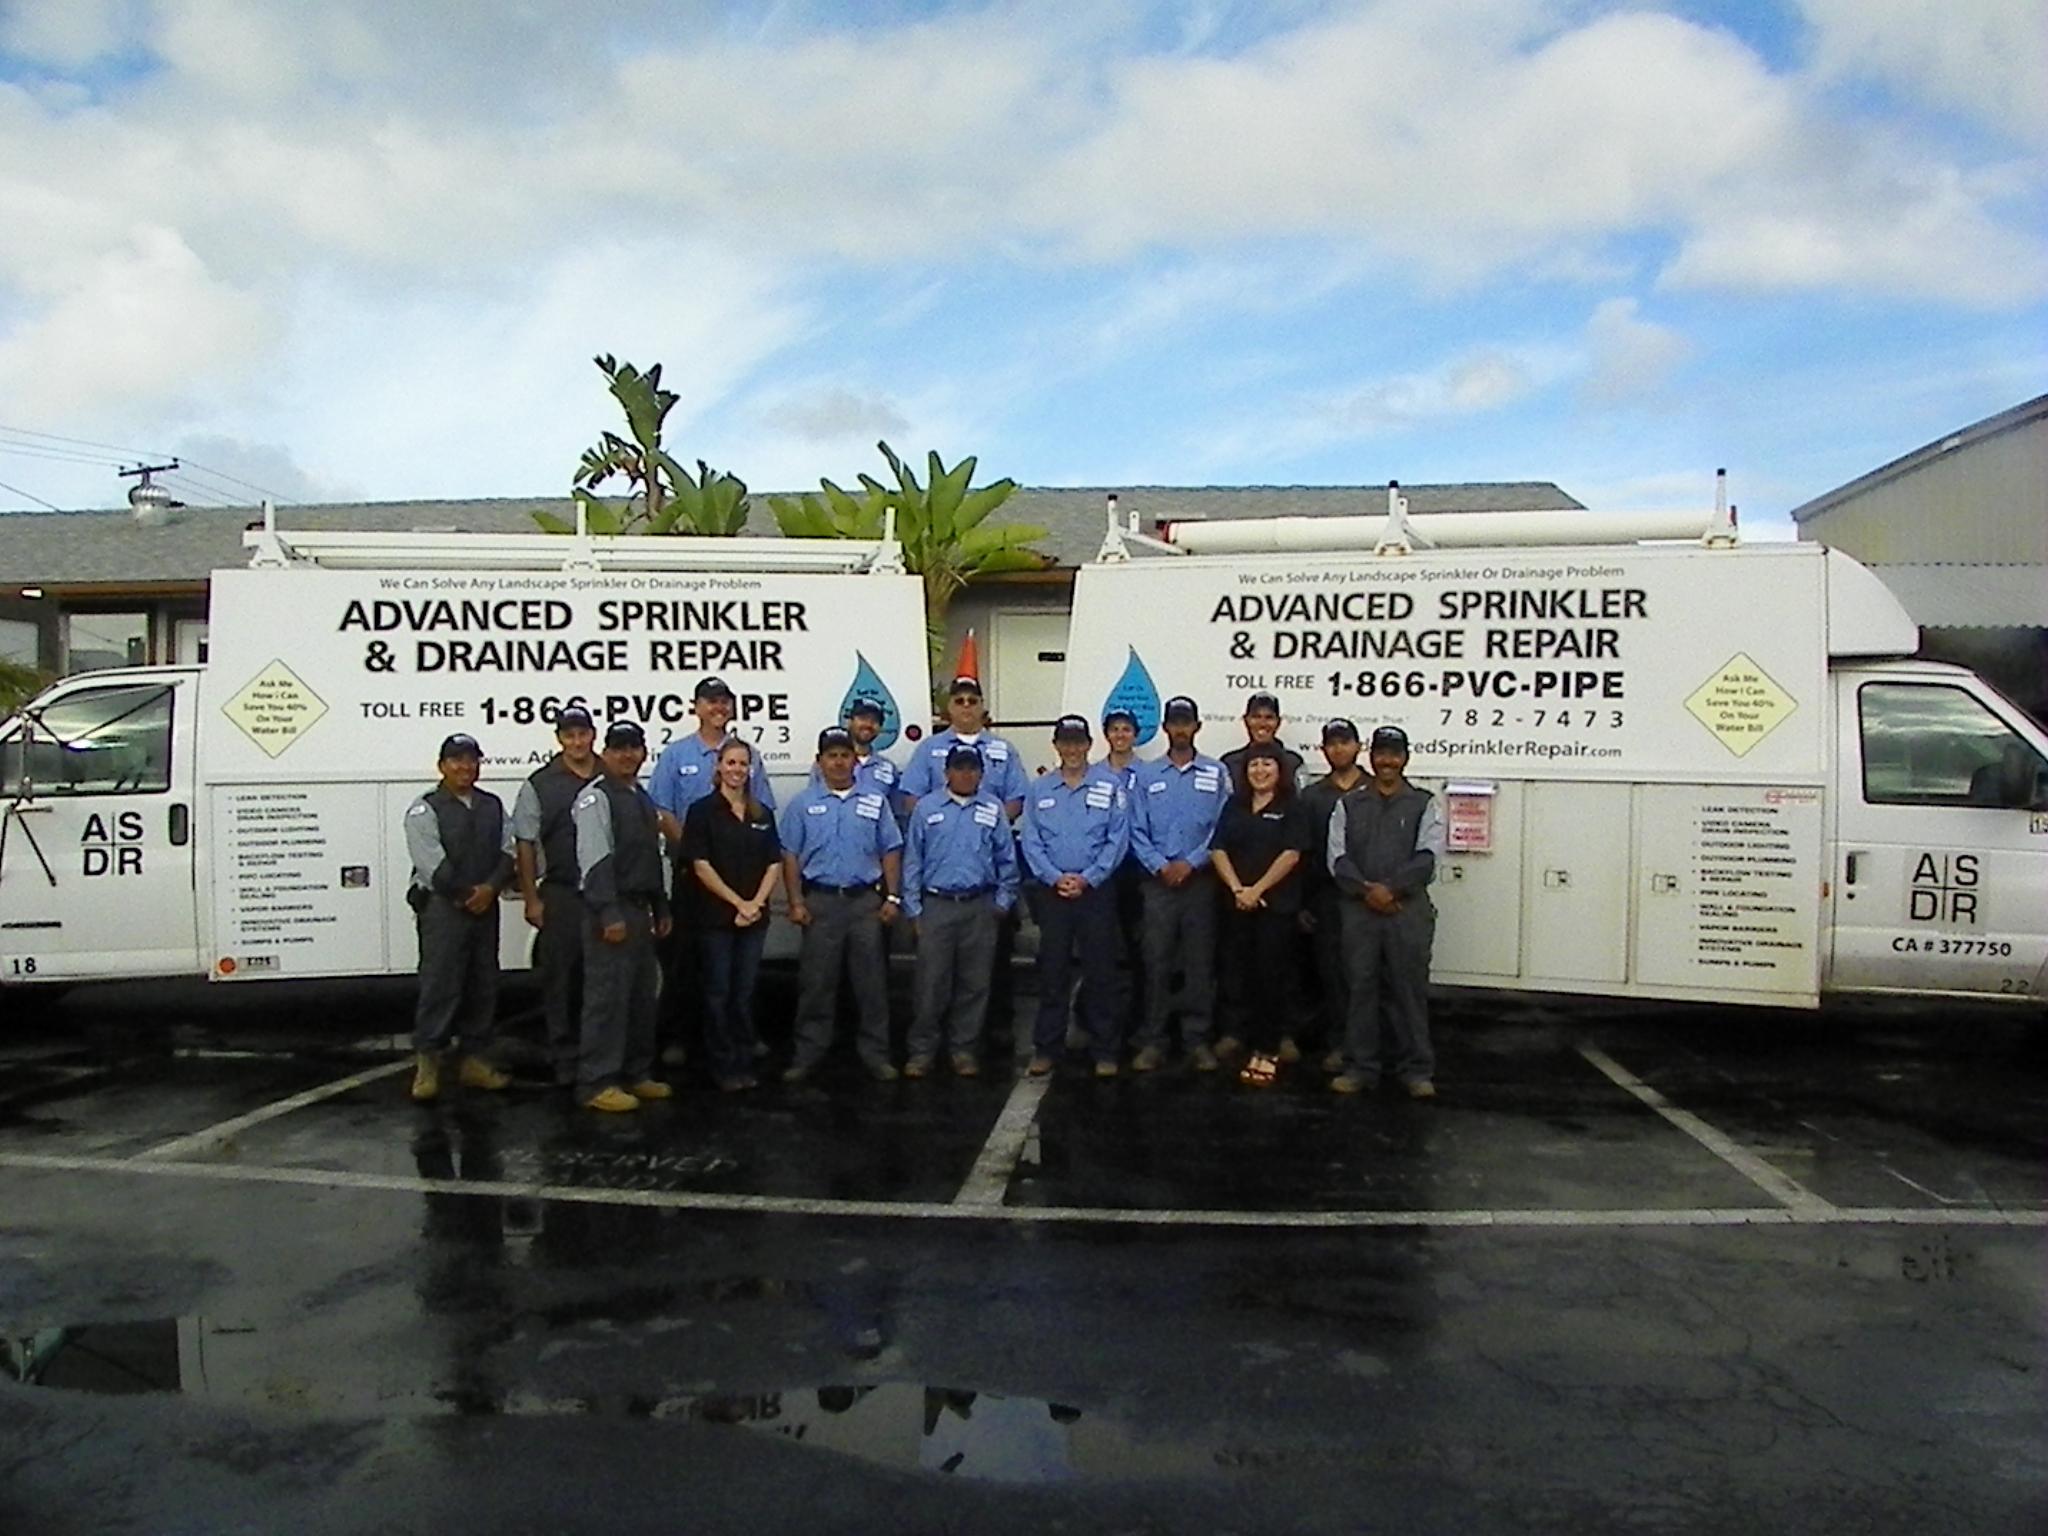 Advanced Sprinkler & Drainage Repair